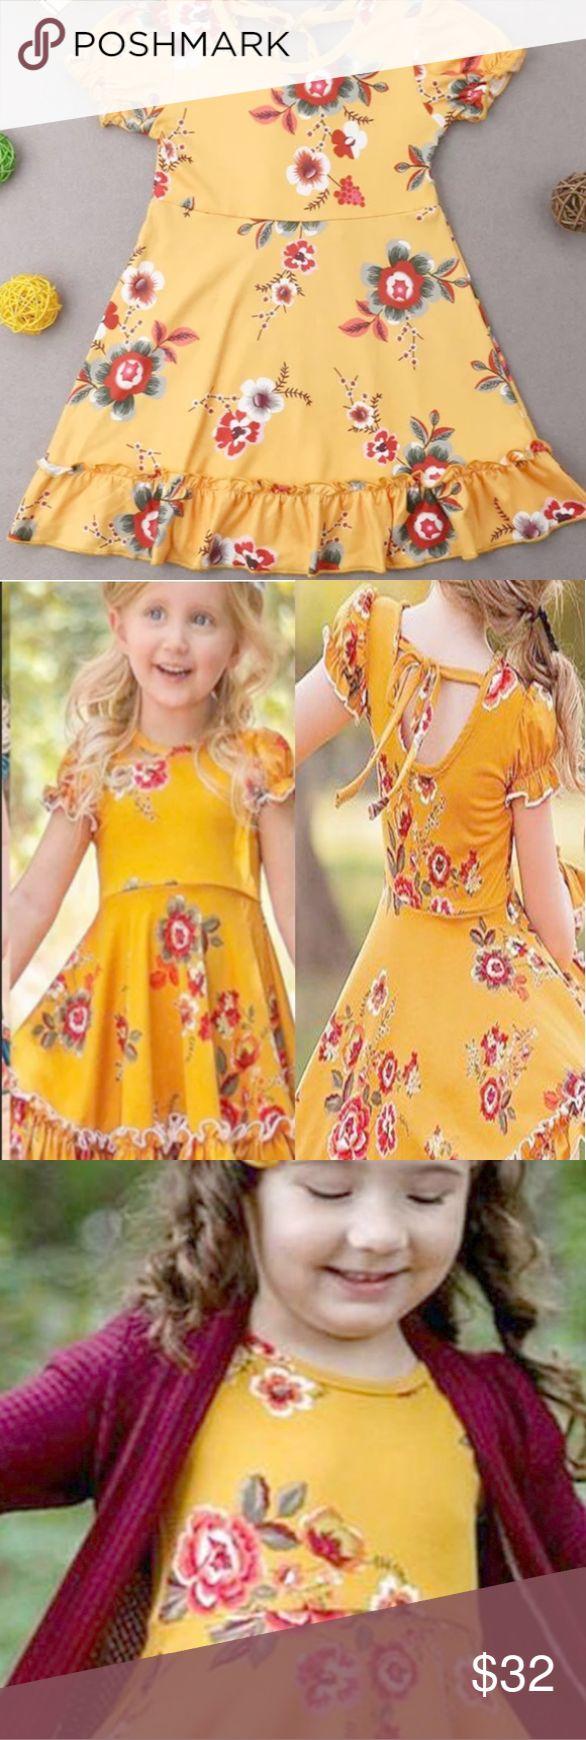 Fashion Dress Up Games For Boy. Jojo's Fashion Show Dress